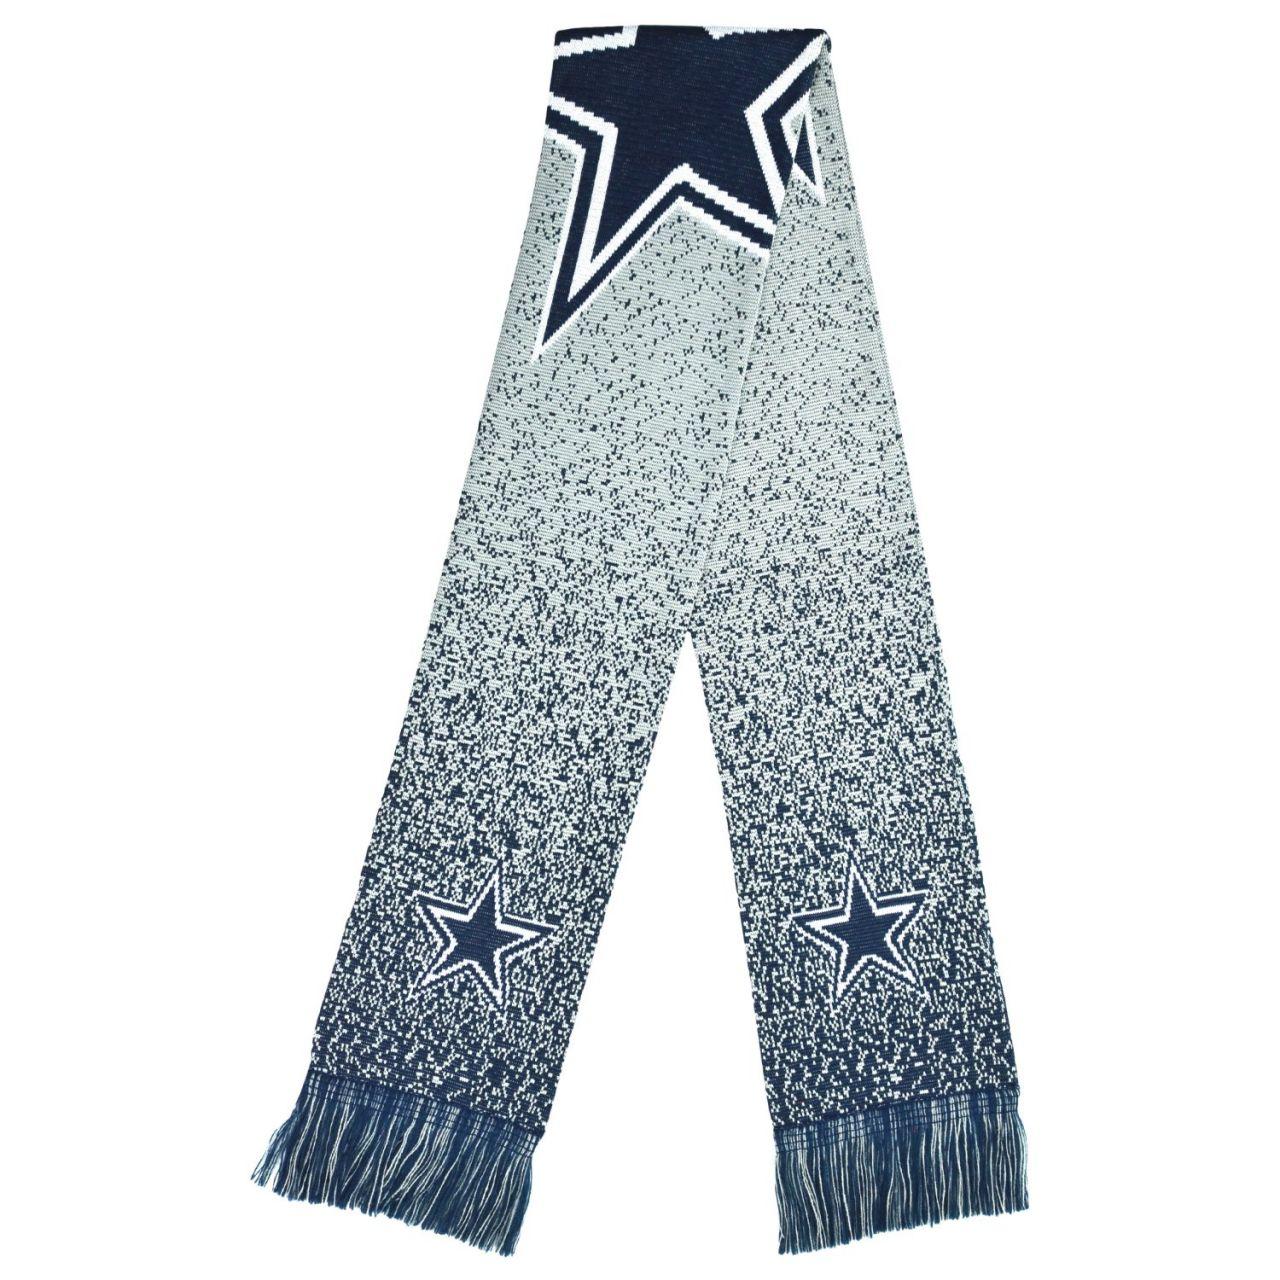 amfoo - FOCO Polyknit Schal - BIG LOGO Dallas Cowboys